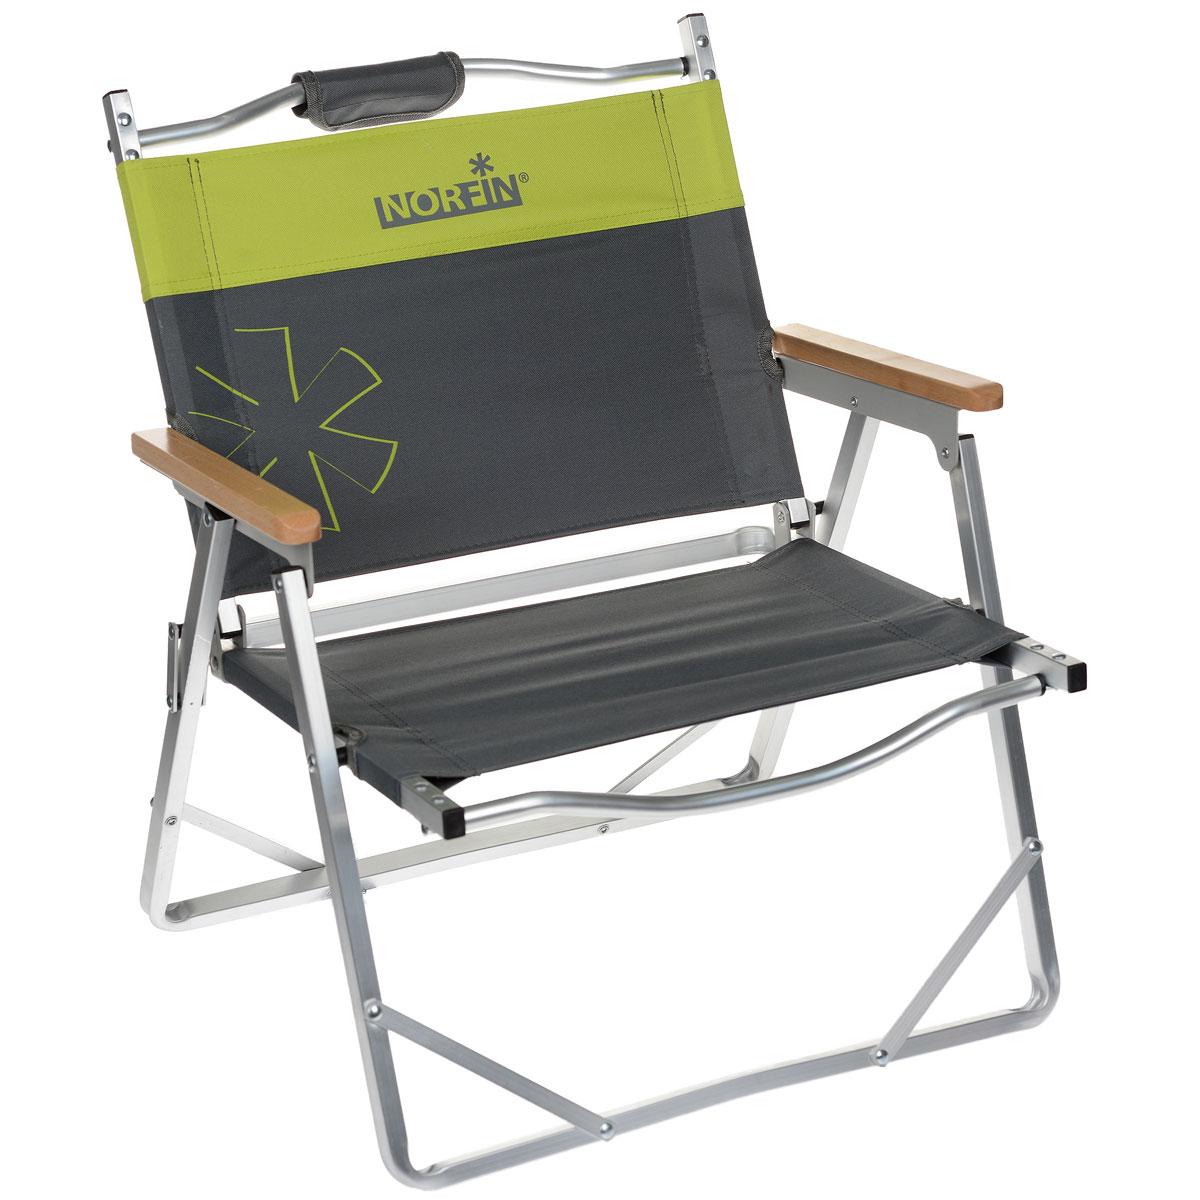 Кресло складное Norfin Alesund NF Alu, цвет: серый, желтый, 47 см х 54 см х 62 см